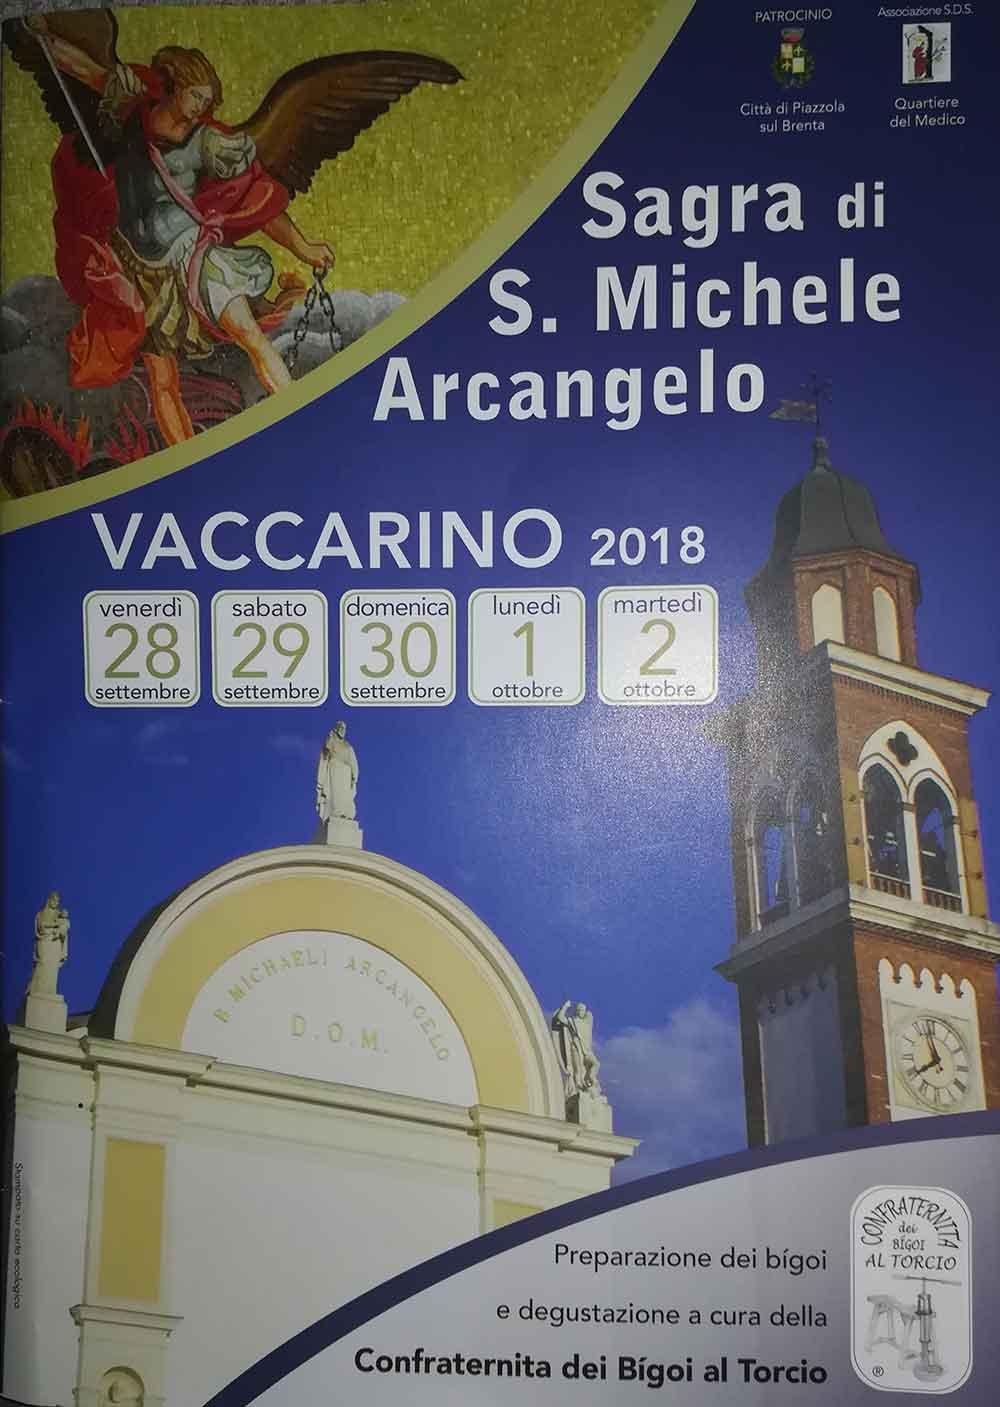 Sagra di San Michele Arcangelo - Vaccarino